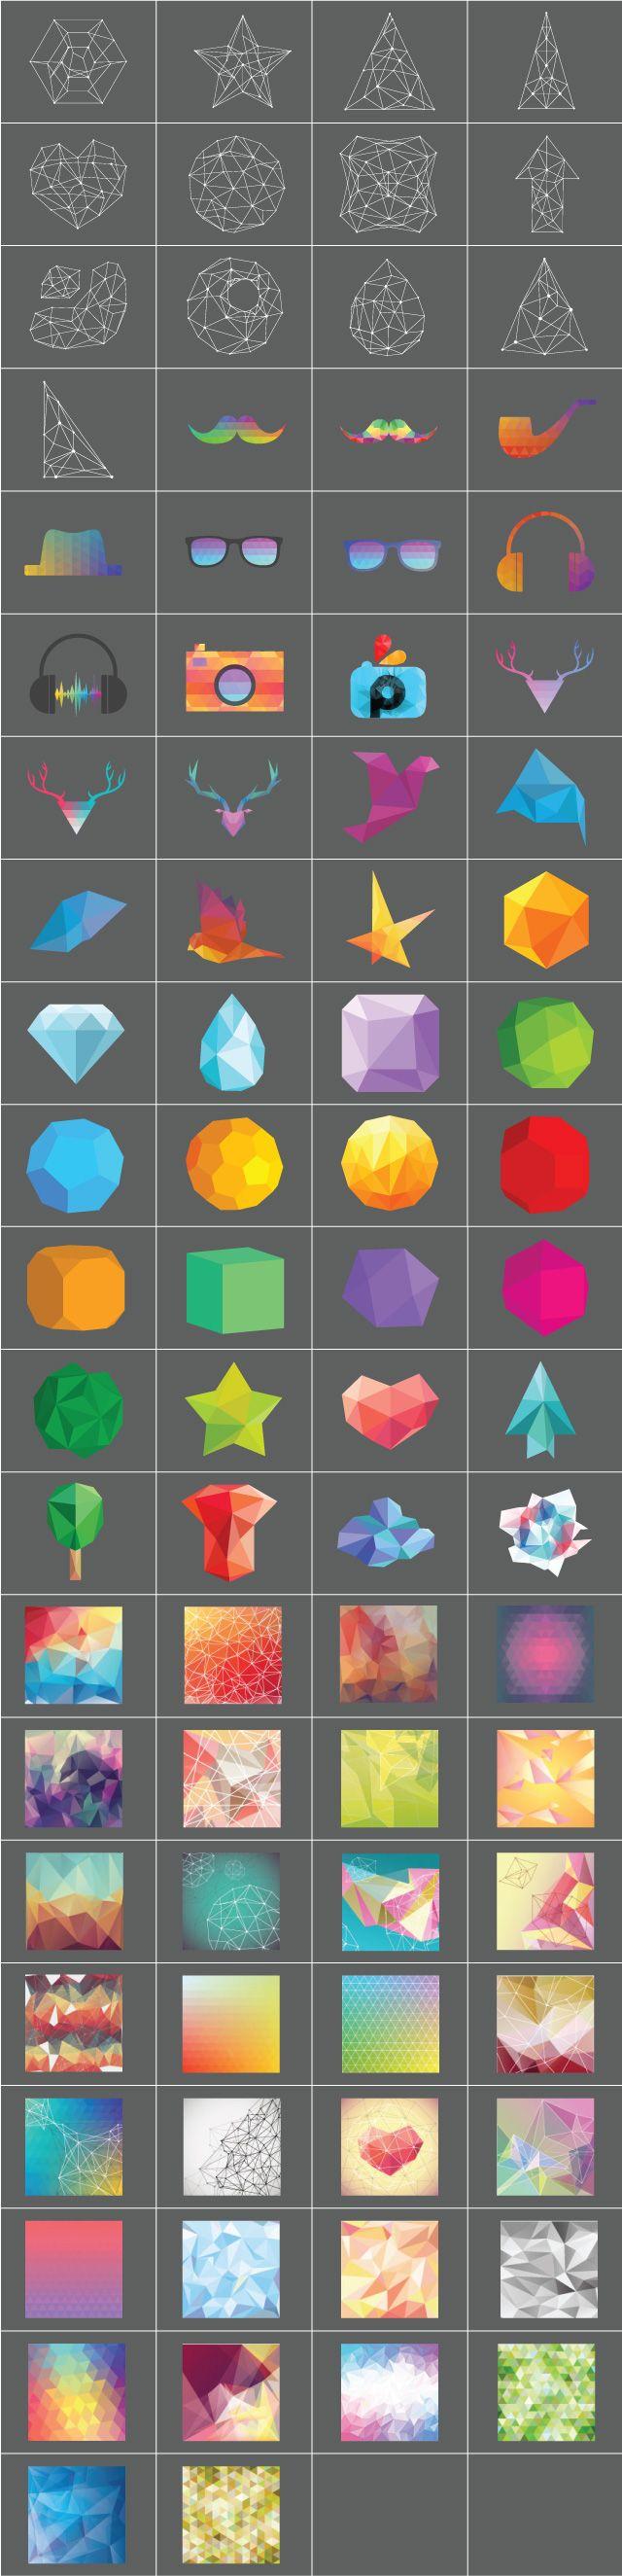 geometric shapes clipart